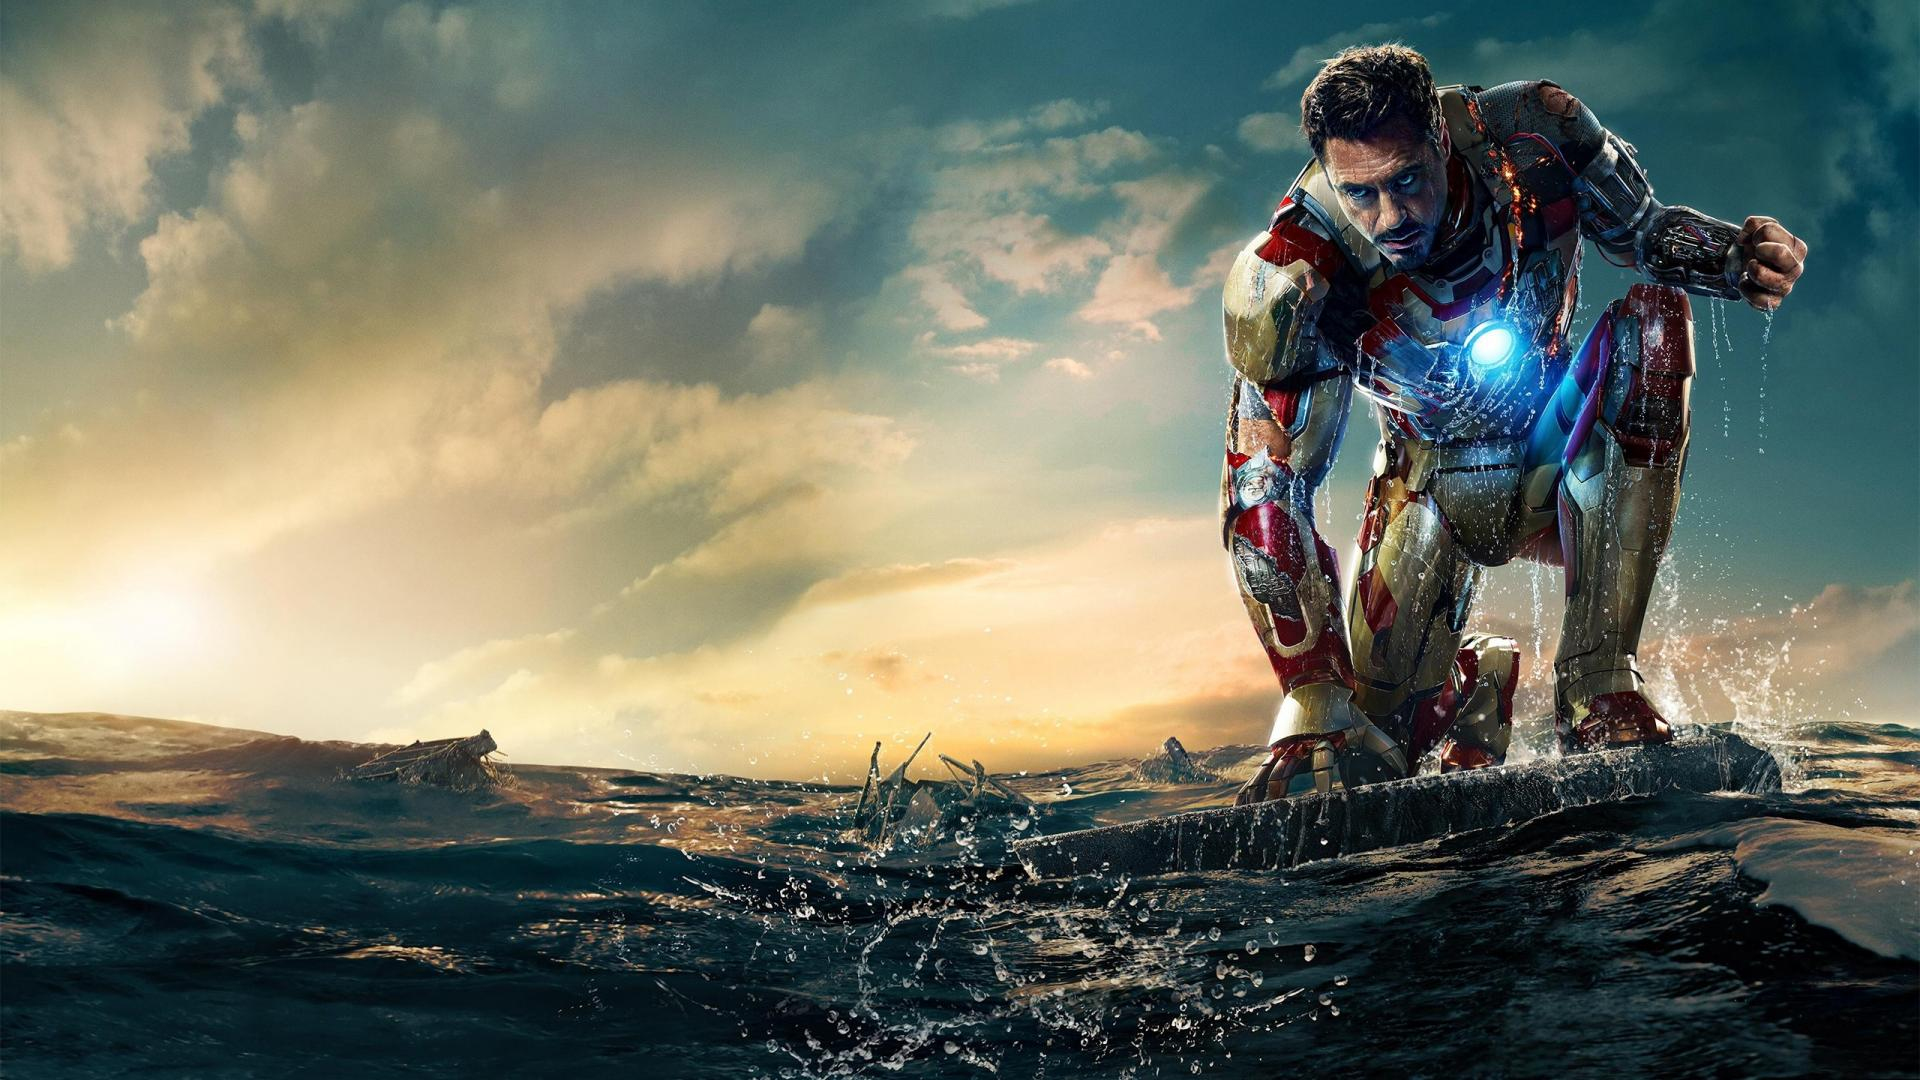 Iron Man 3 Wallpaper Hd 1024x768